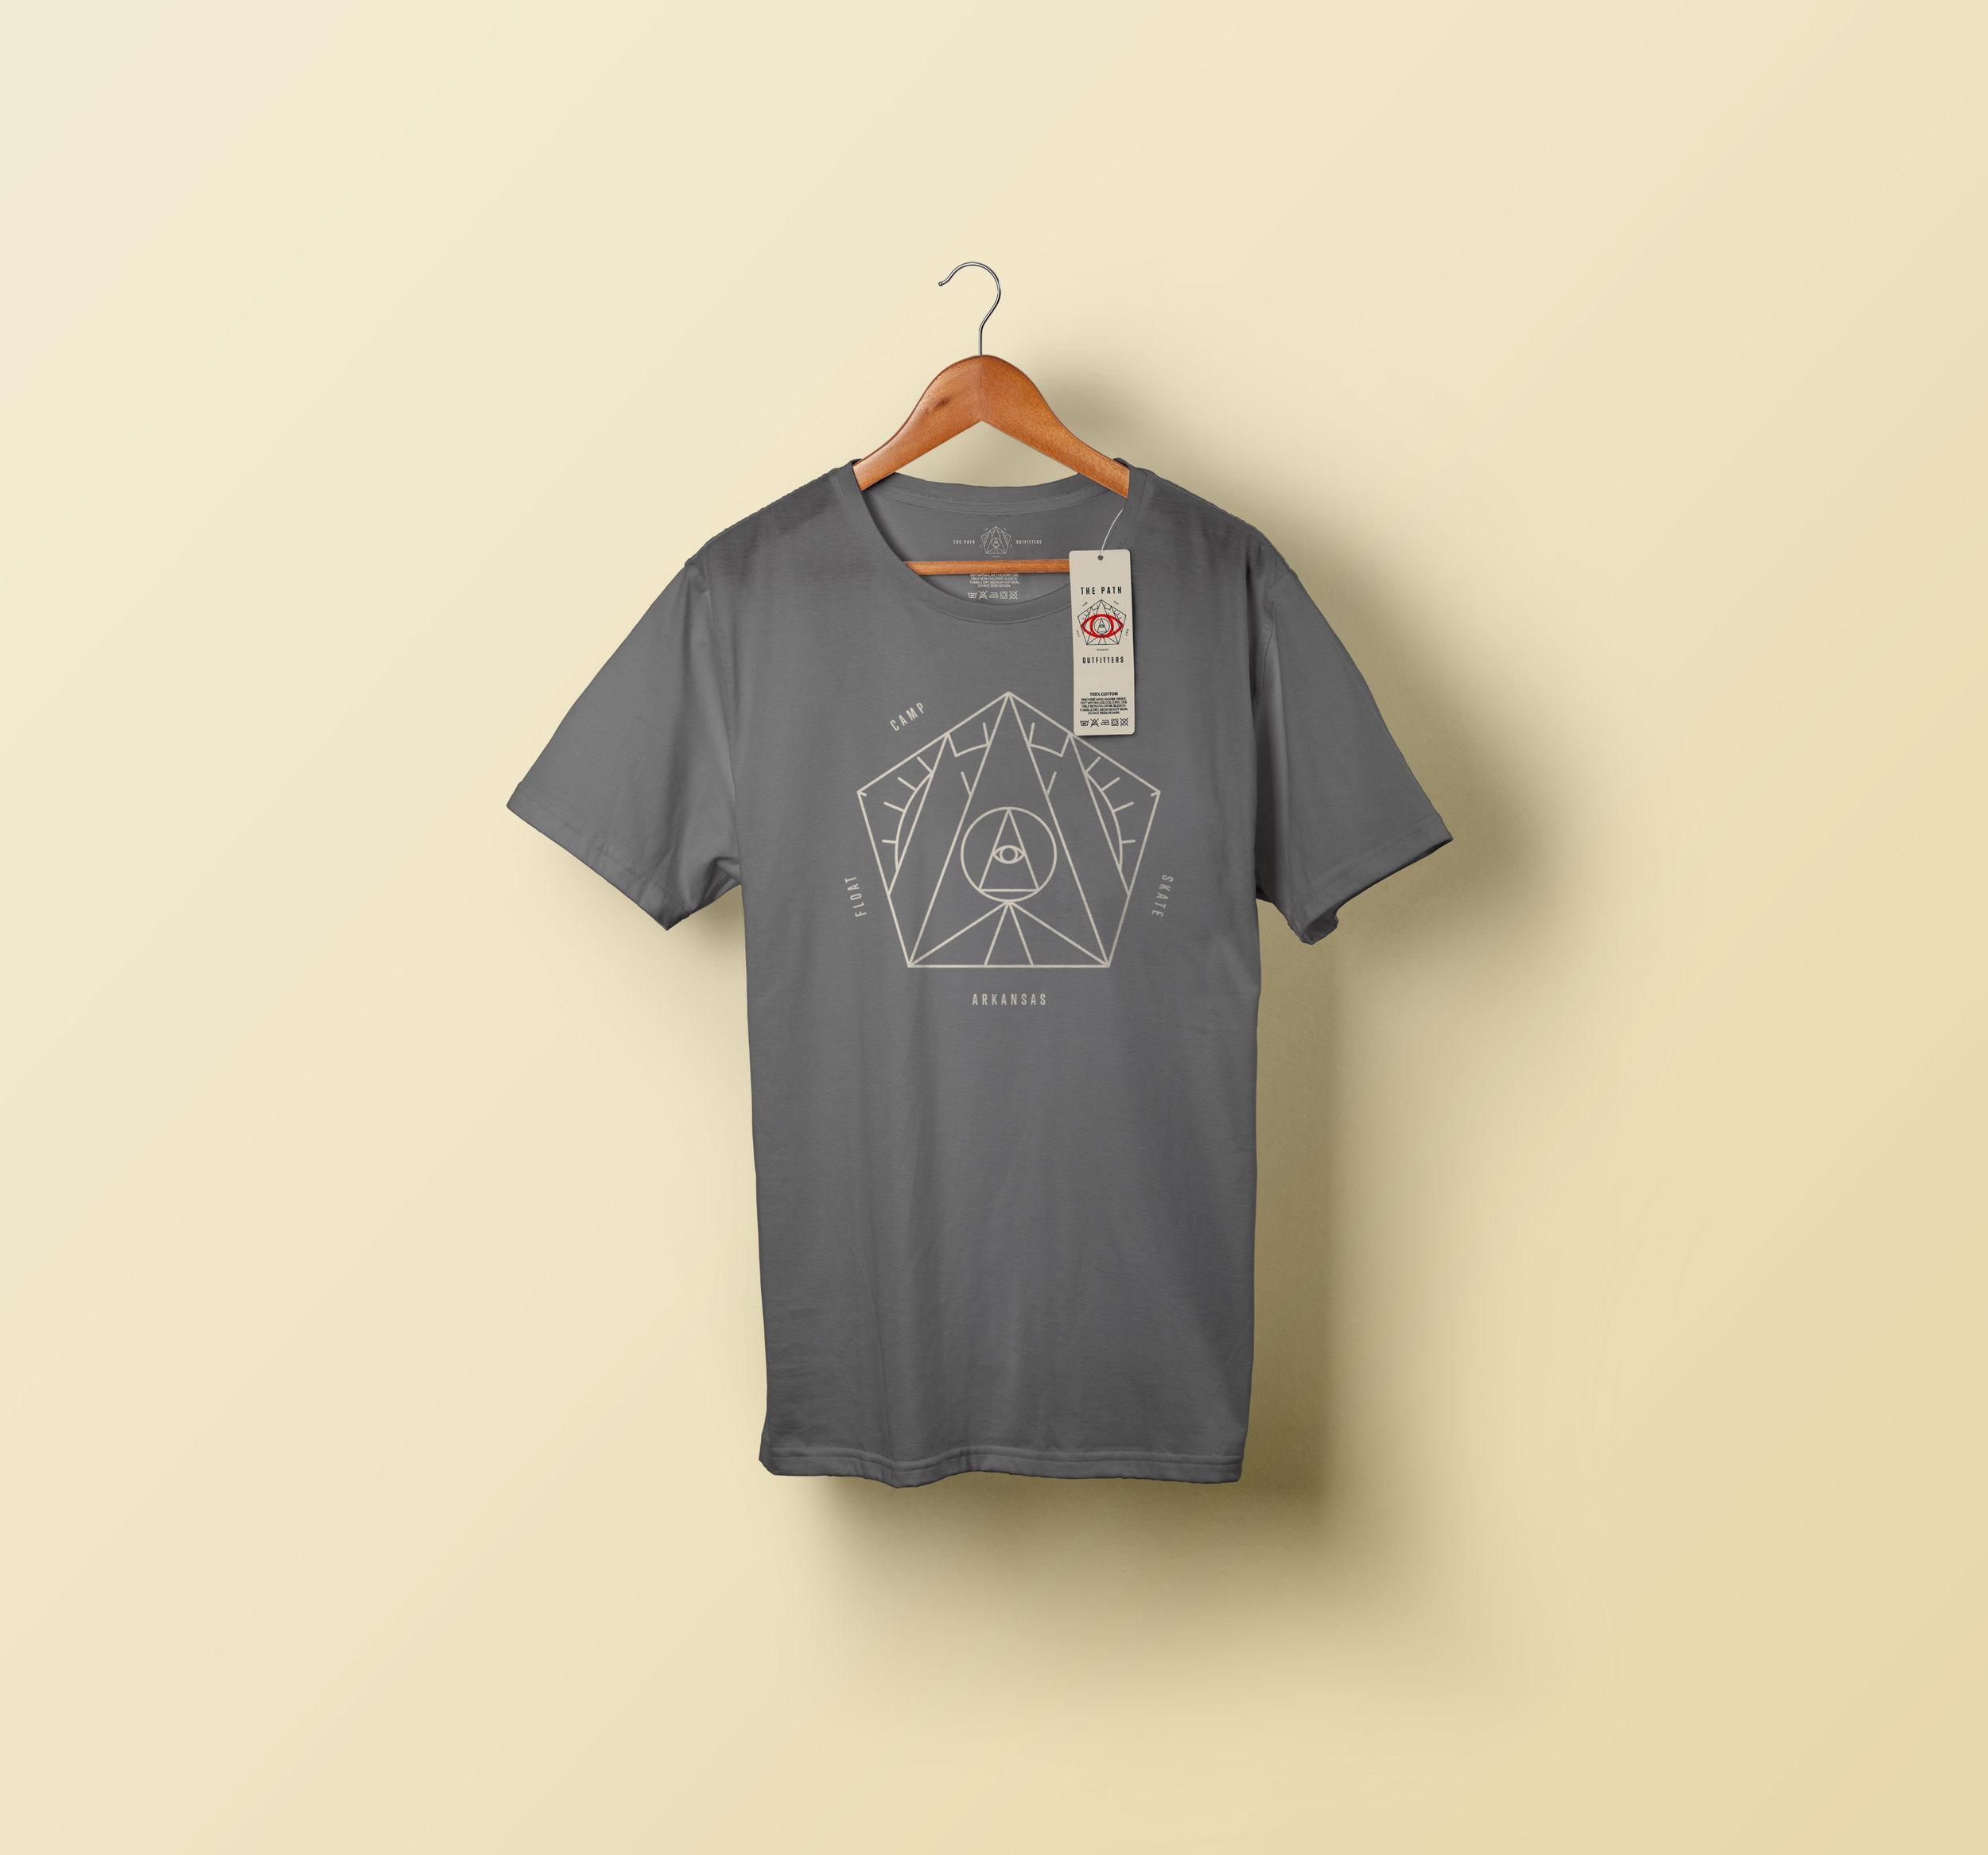 T-Shirt-Hanging-Mockup-D-v1.jpg